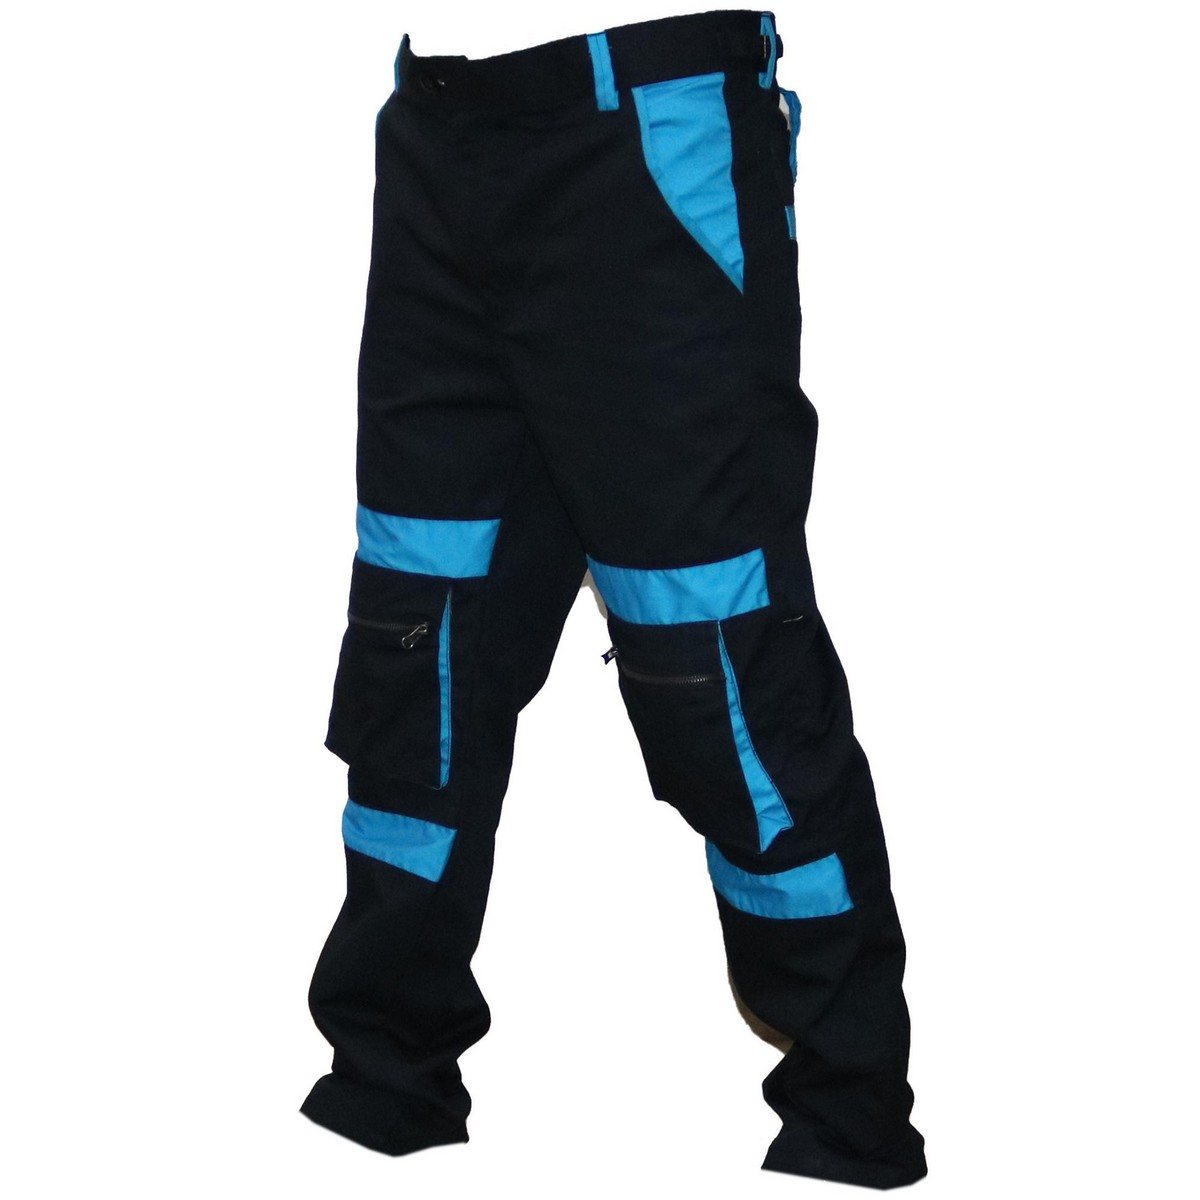 Two Tone Black & Blue Cargo Trouser Cargo Pants